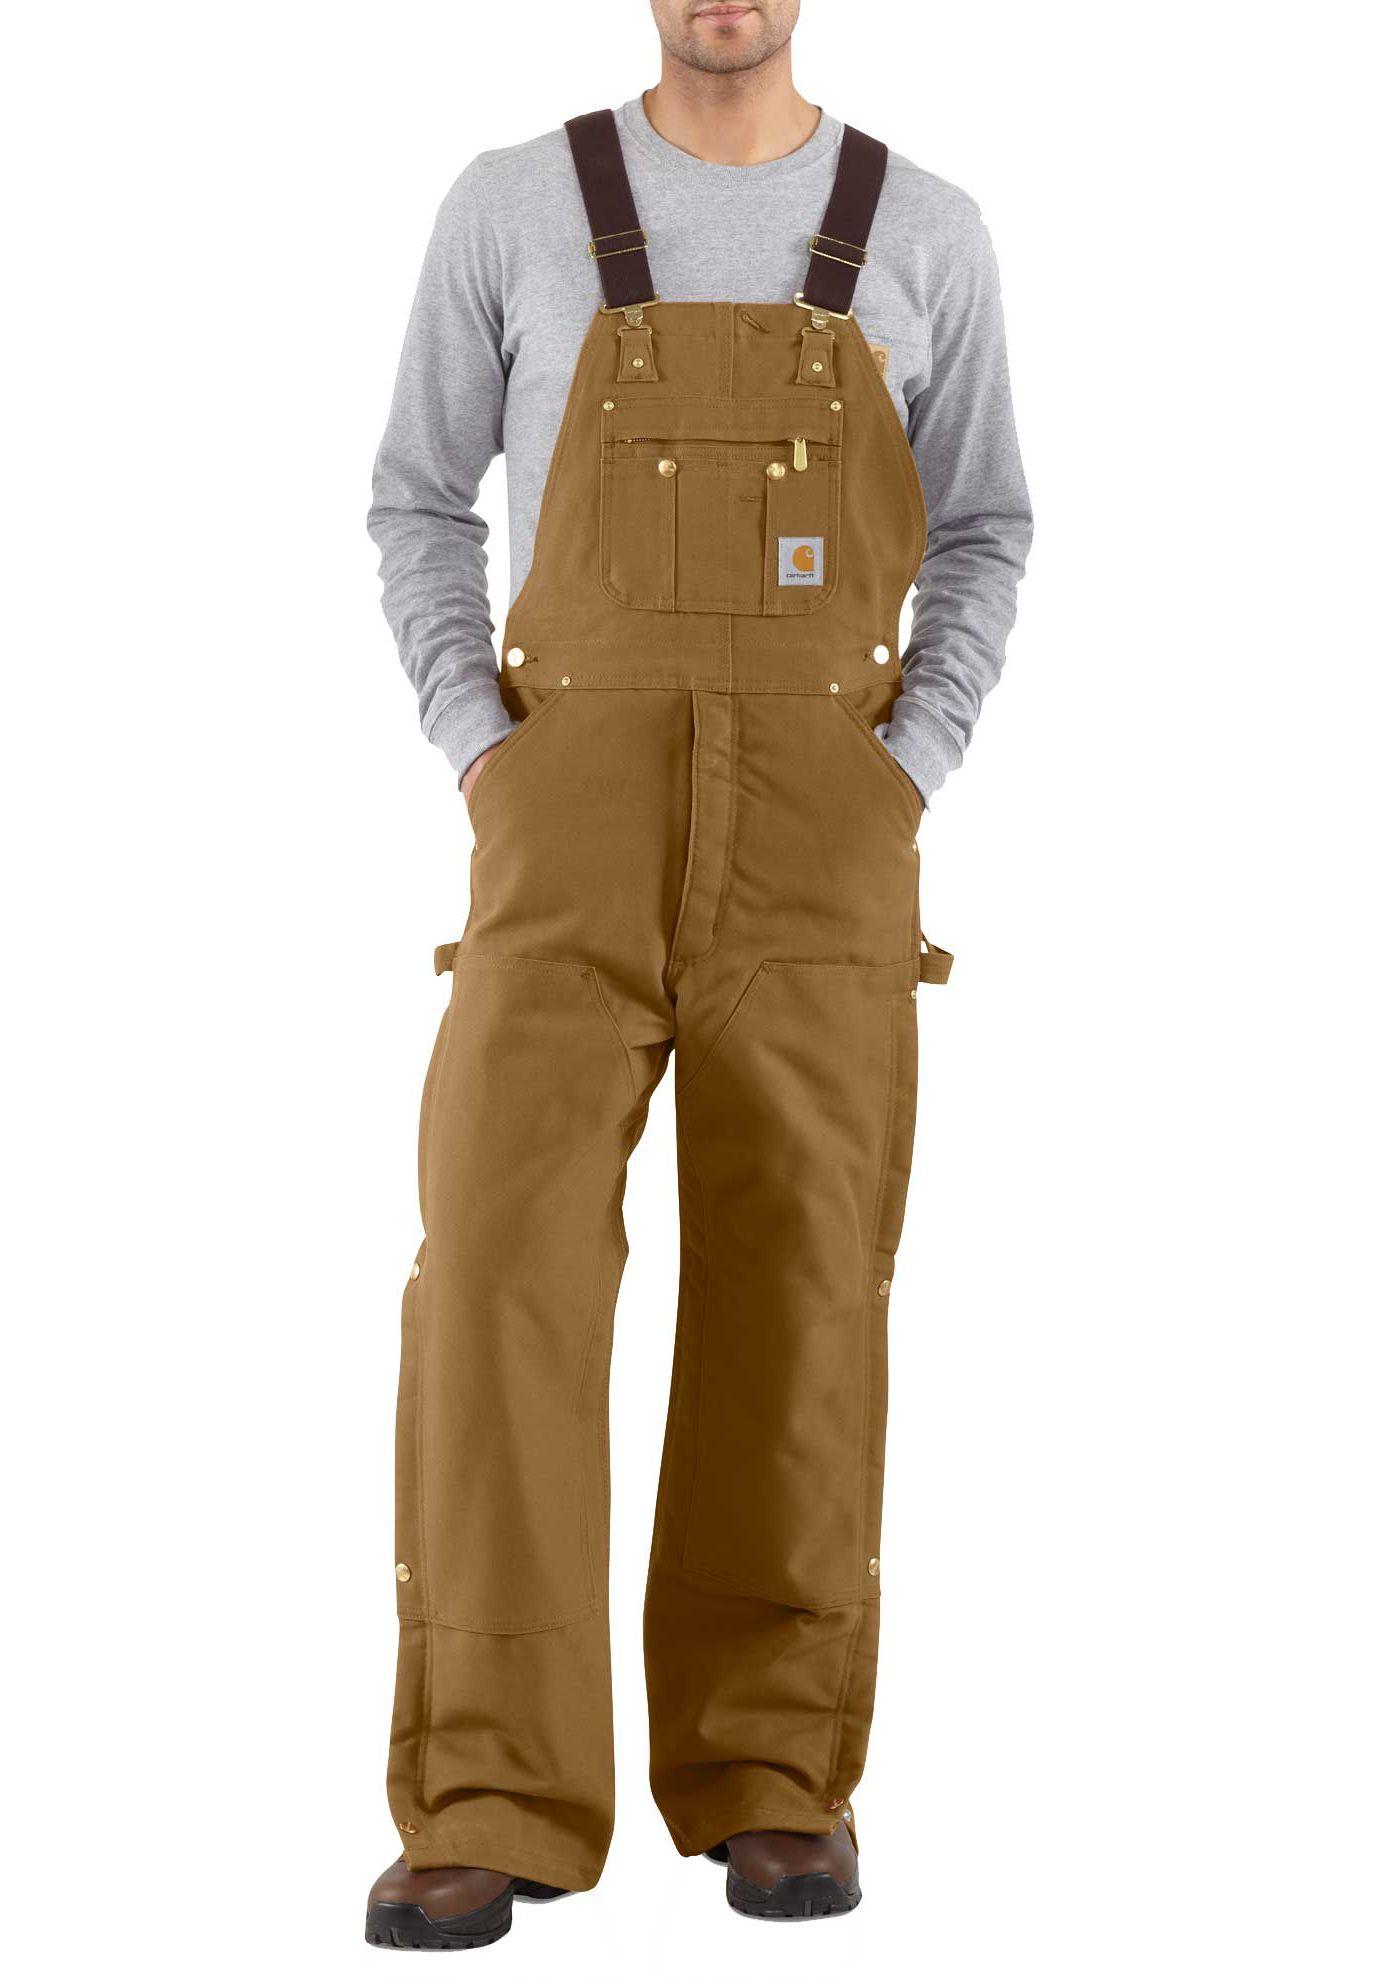 Carhartt Men's Zip-To-Thigh Quilt Lined Duck Bibs